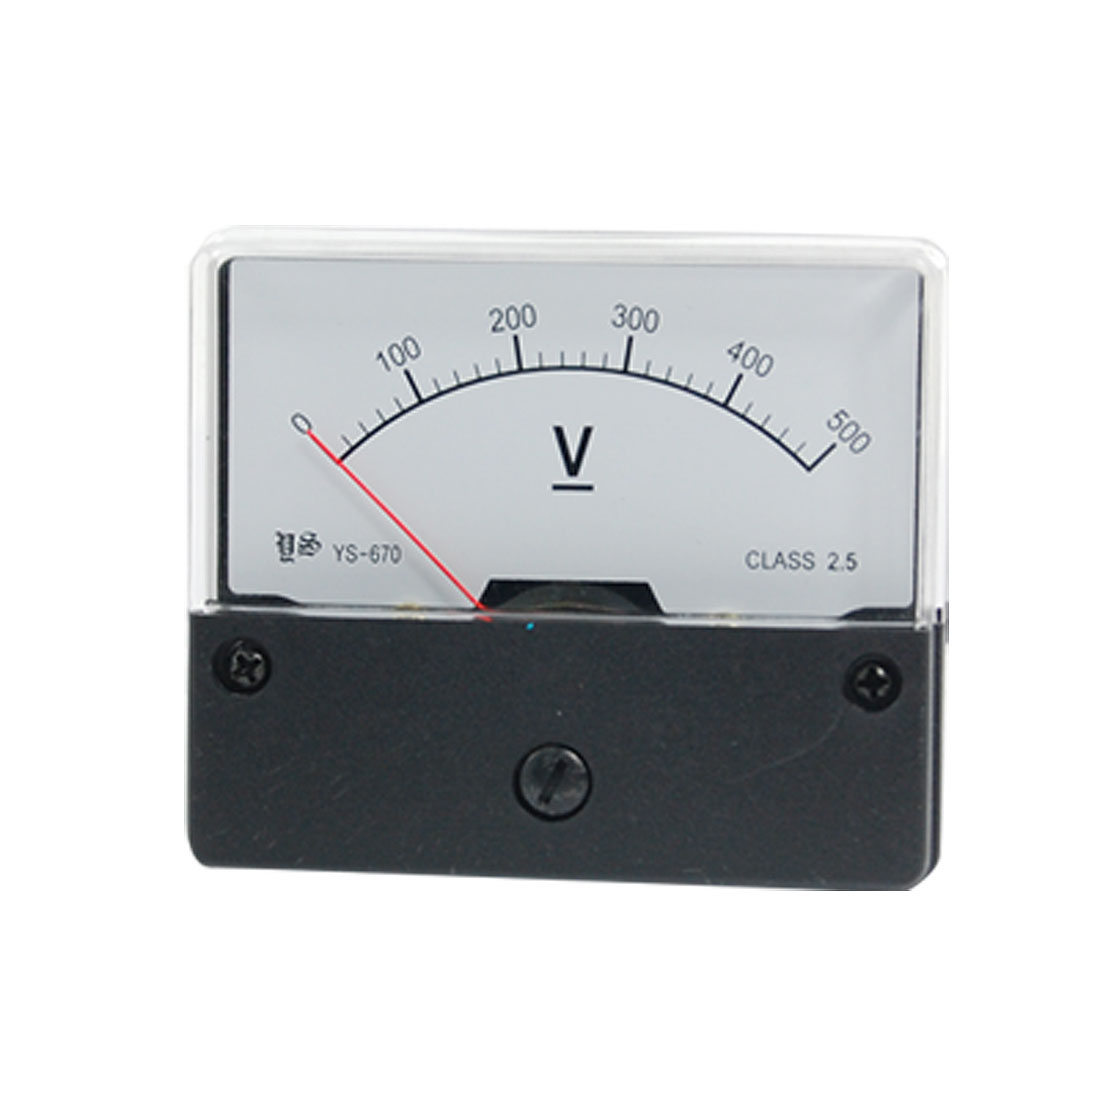 YS-670 DC 0-500V Panel Mount Meter Analog Voltmeter Gauge